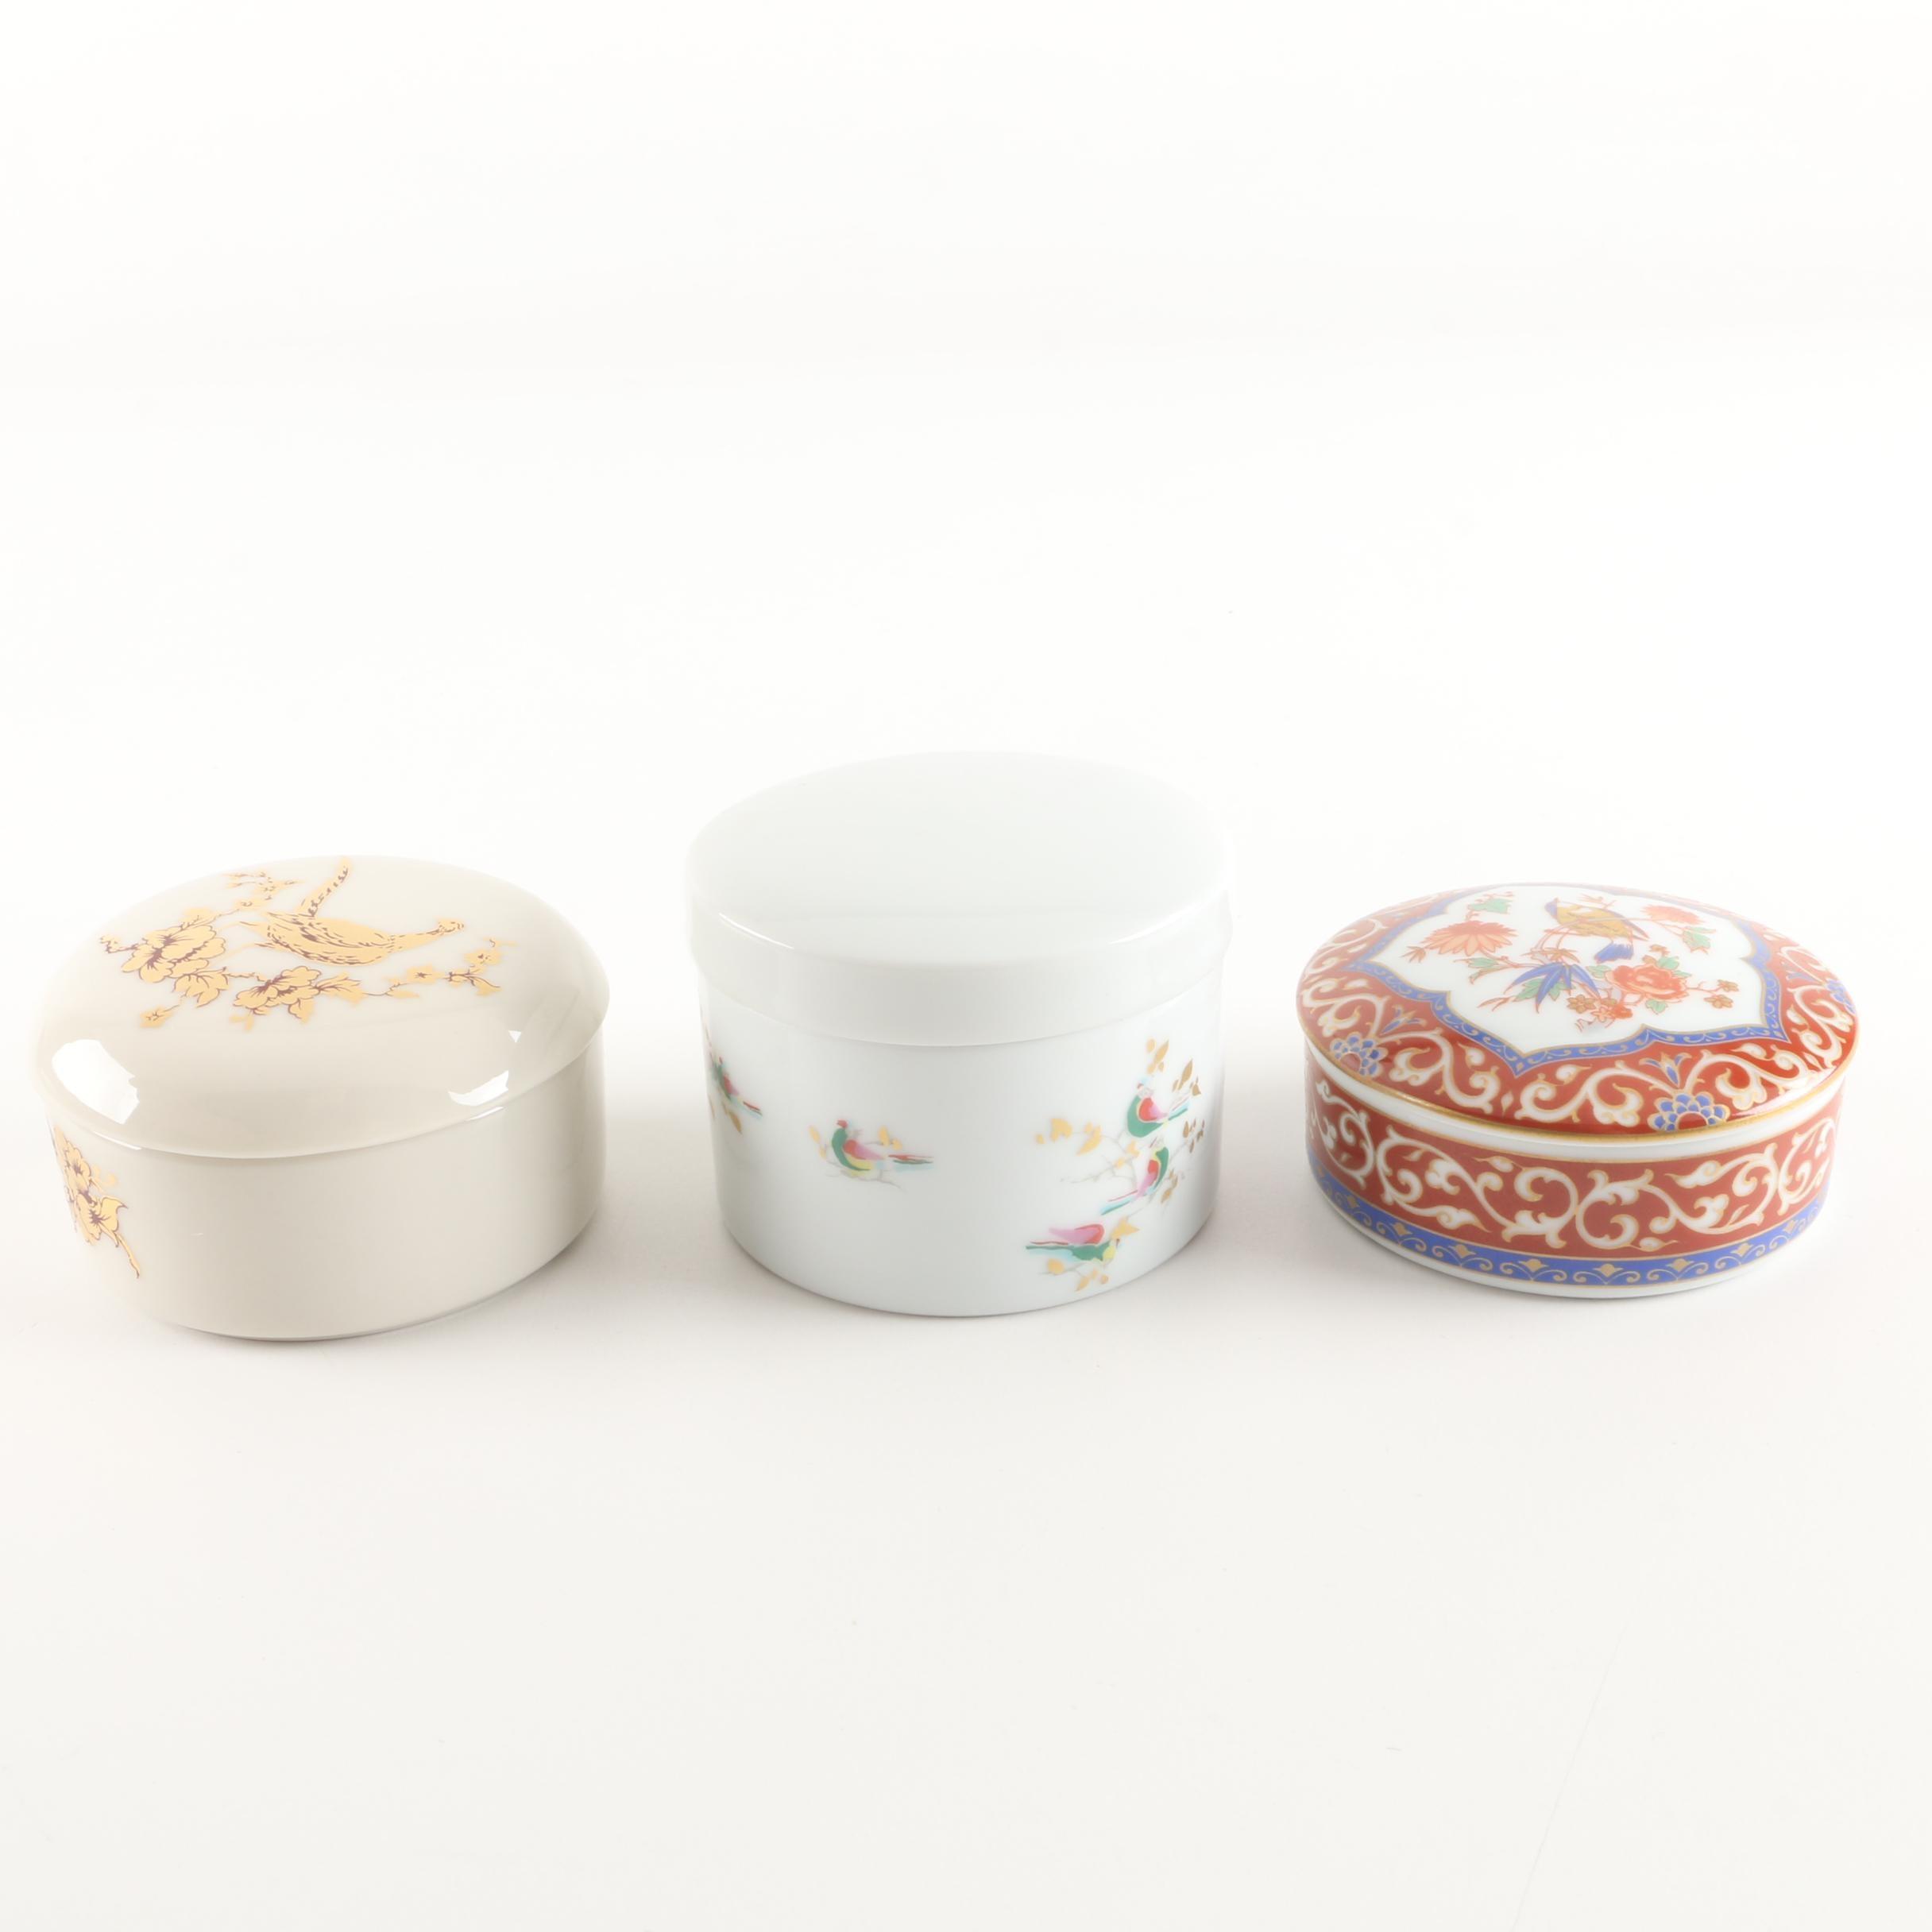 Porcelain Bird Themed Trinket Boxes Featuring Gorham